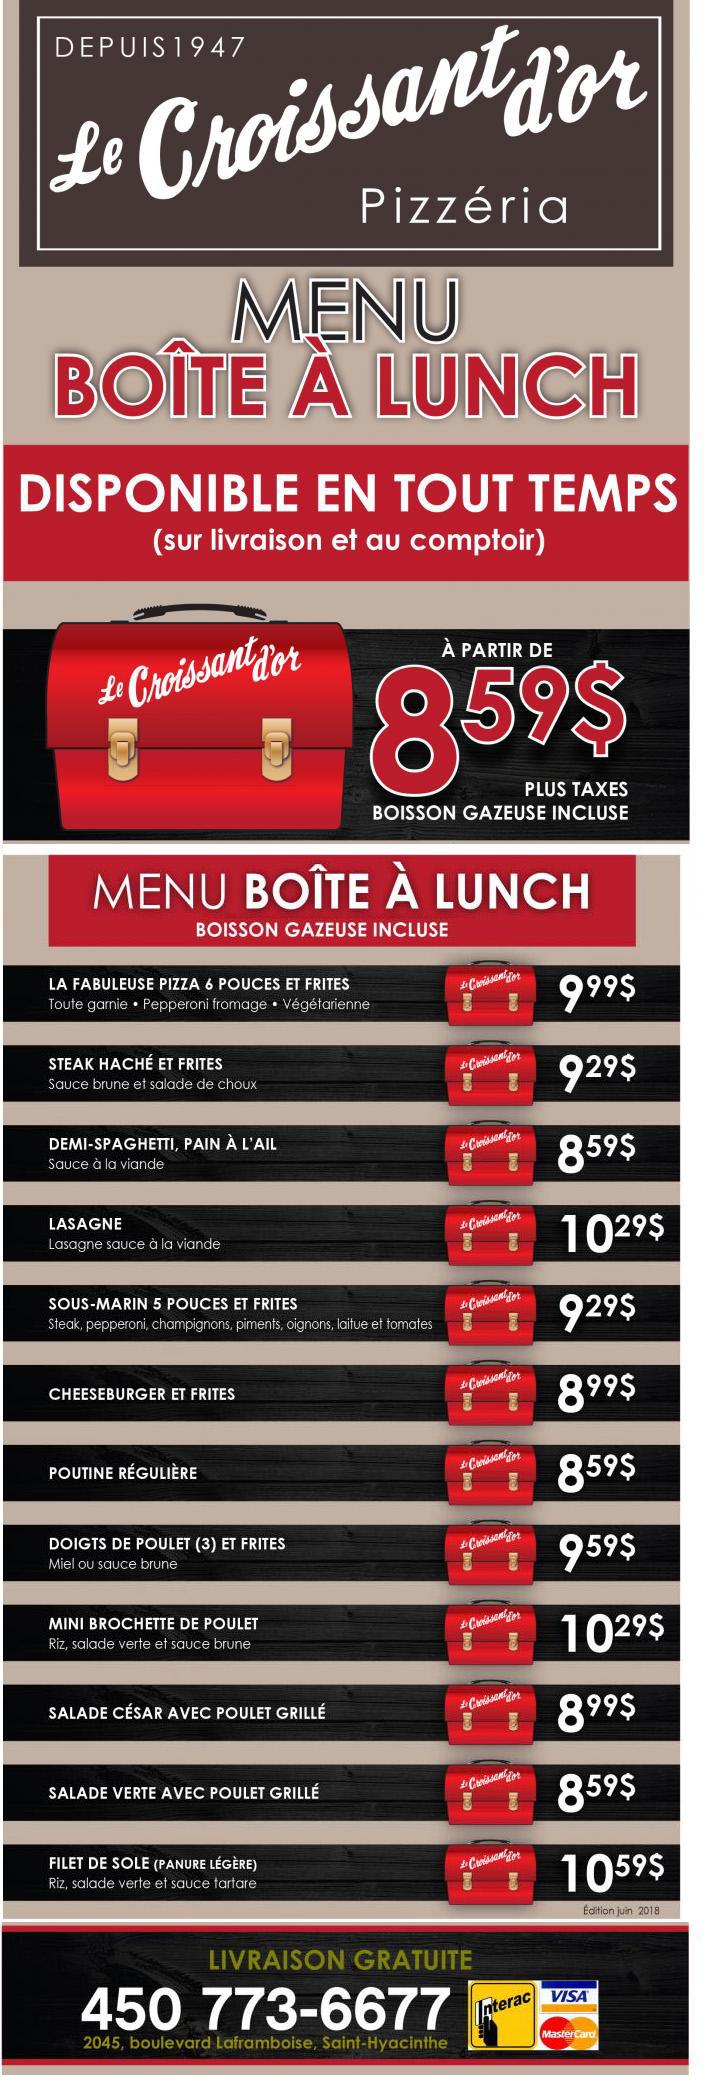 menu_boitealunch07718